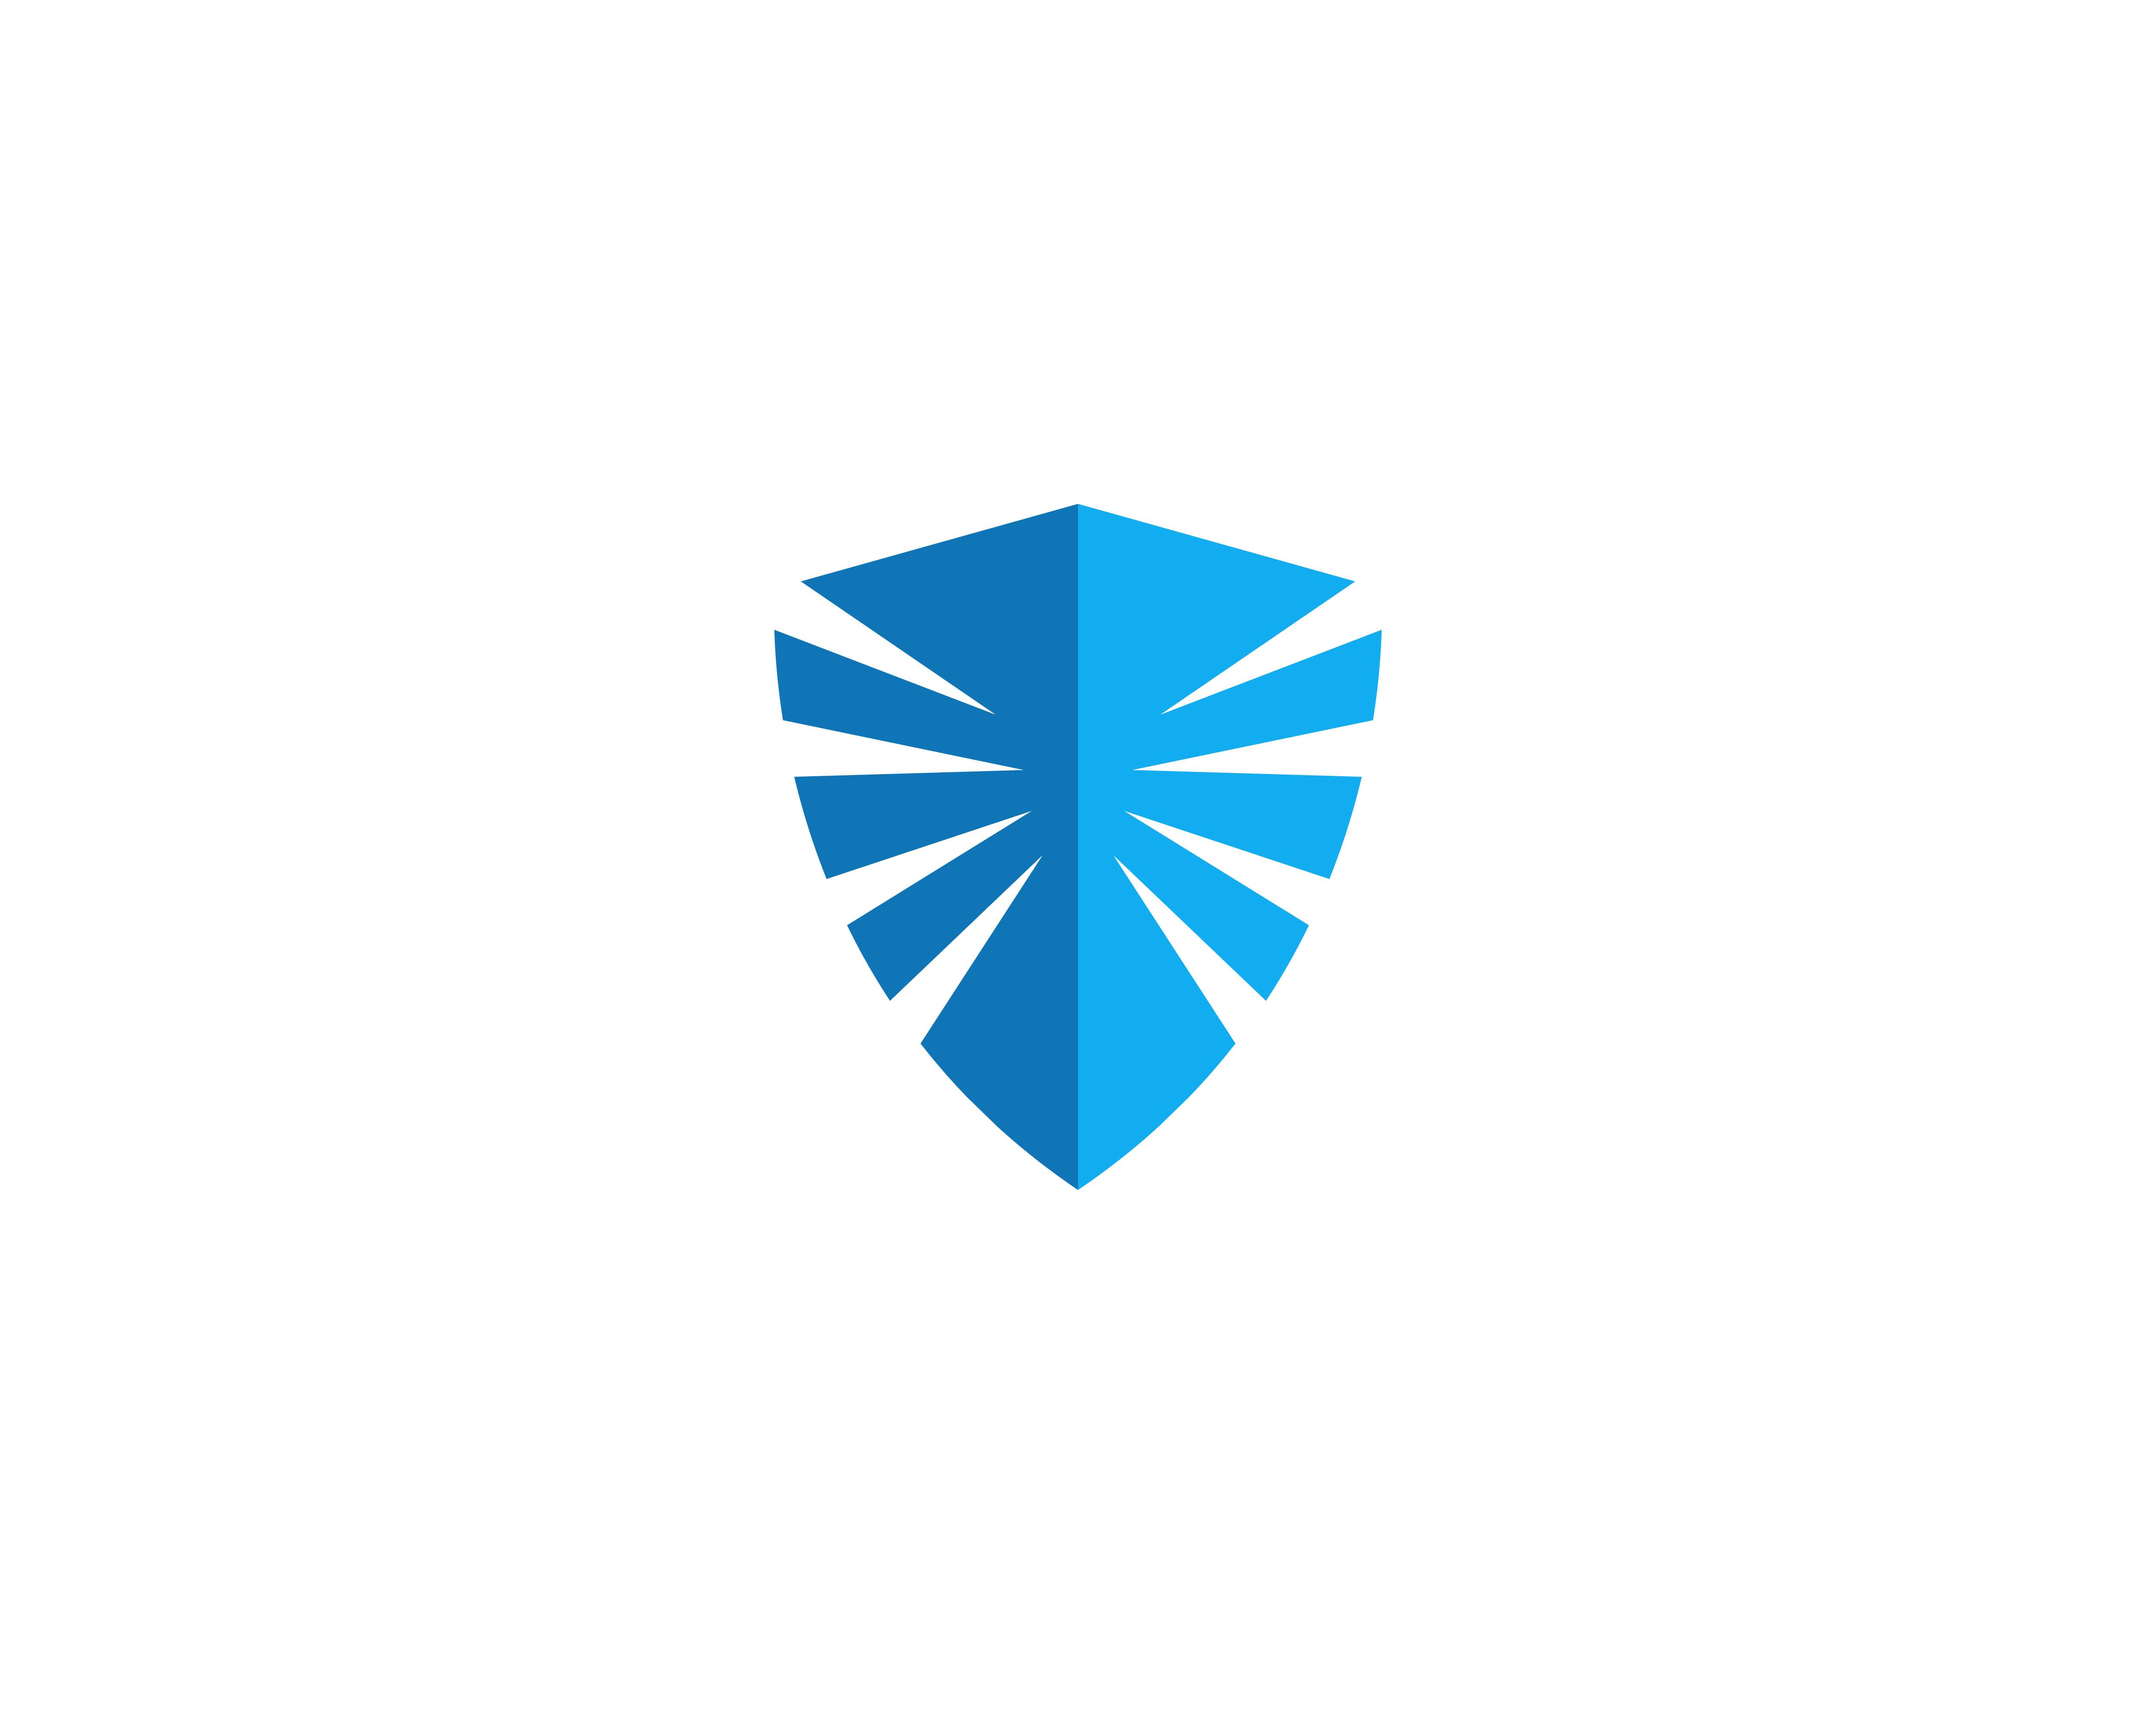 shield Security guard logo design vector template 626606 ...